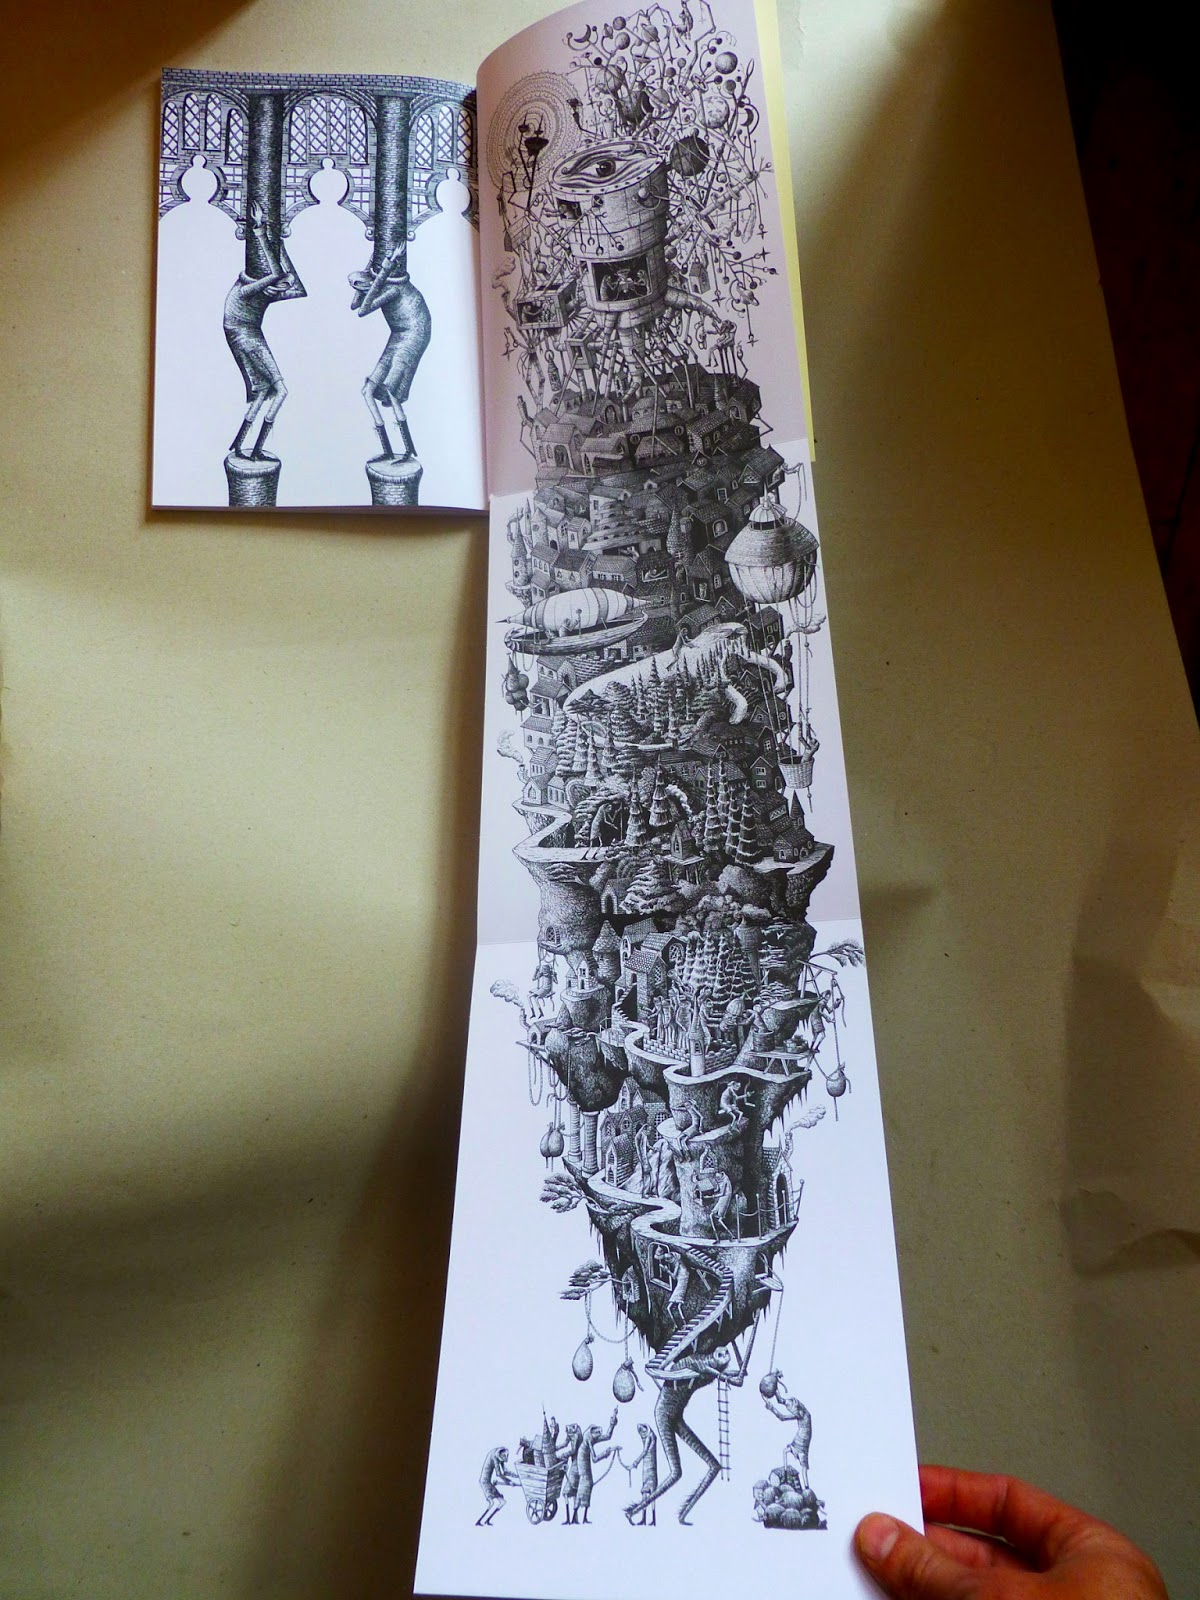 phlegm book poster